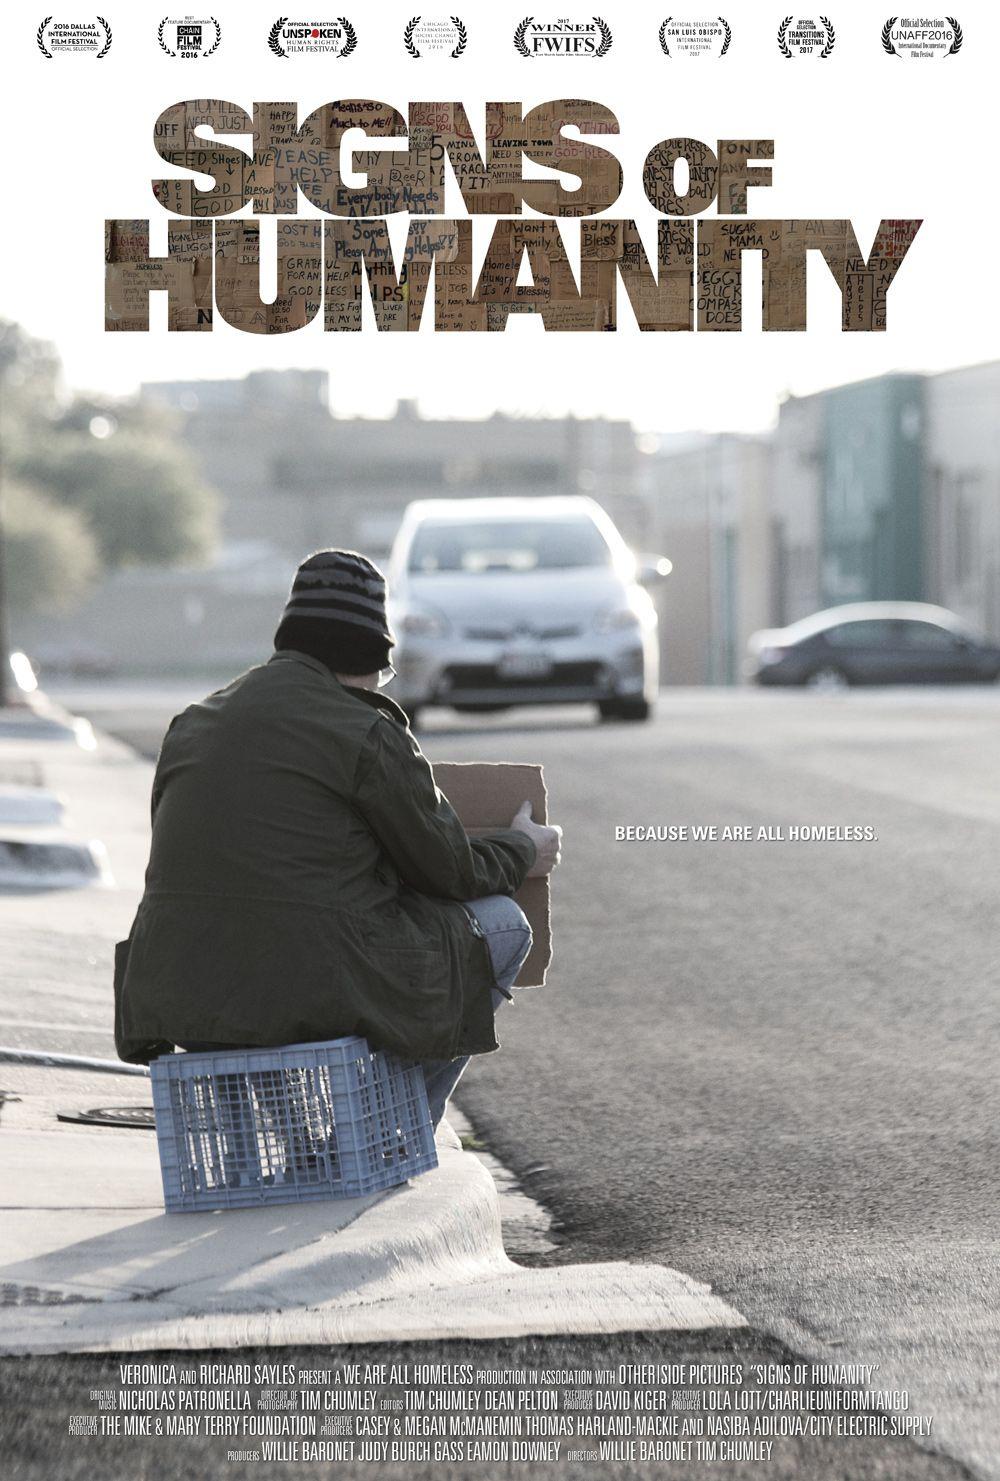 We Are All Homeless We Are All Homeless Homeless Health Awareness Poster Awareness Poster